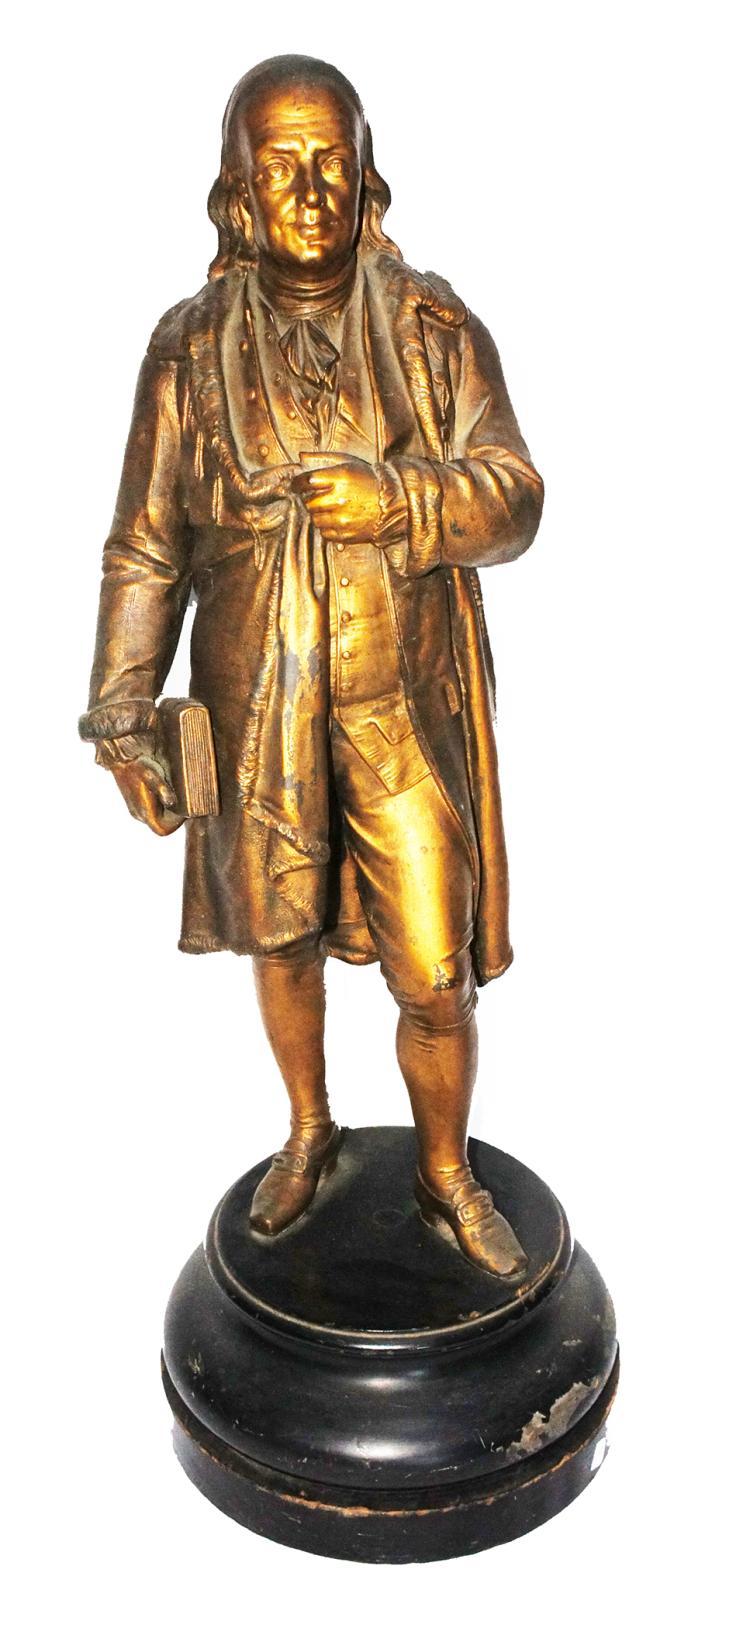 Circa 1876 American Portrait Statue of Patriot Benjamin Franklin